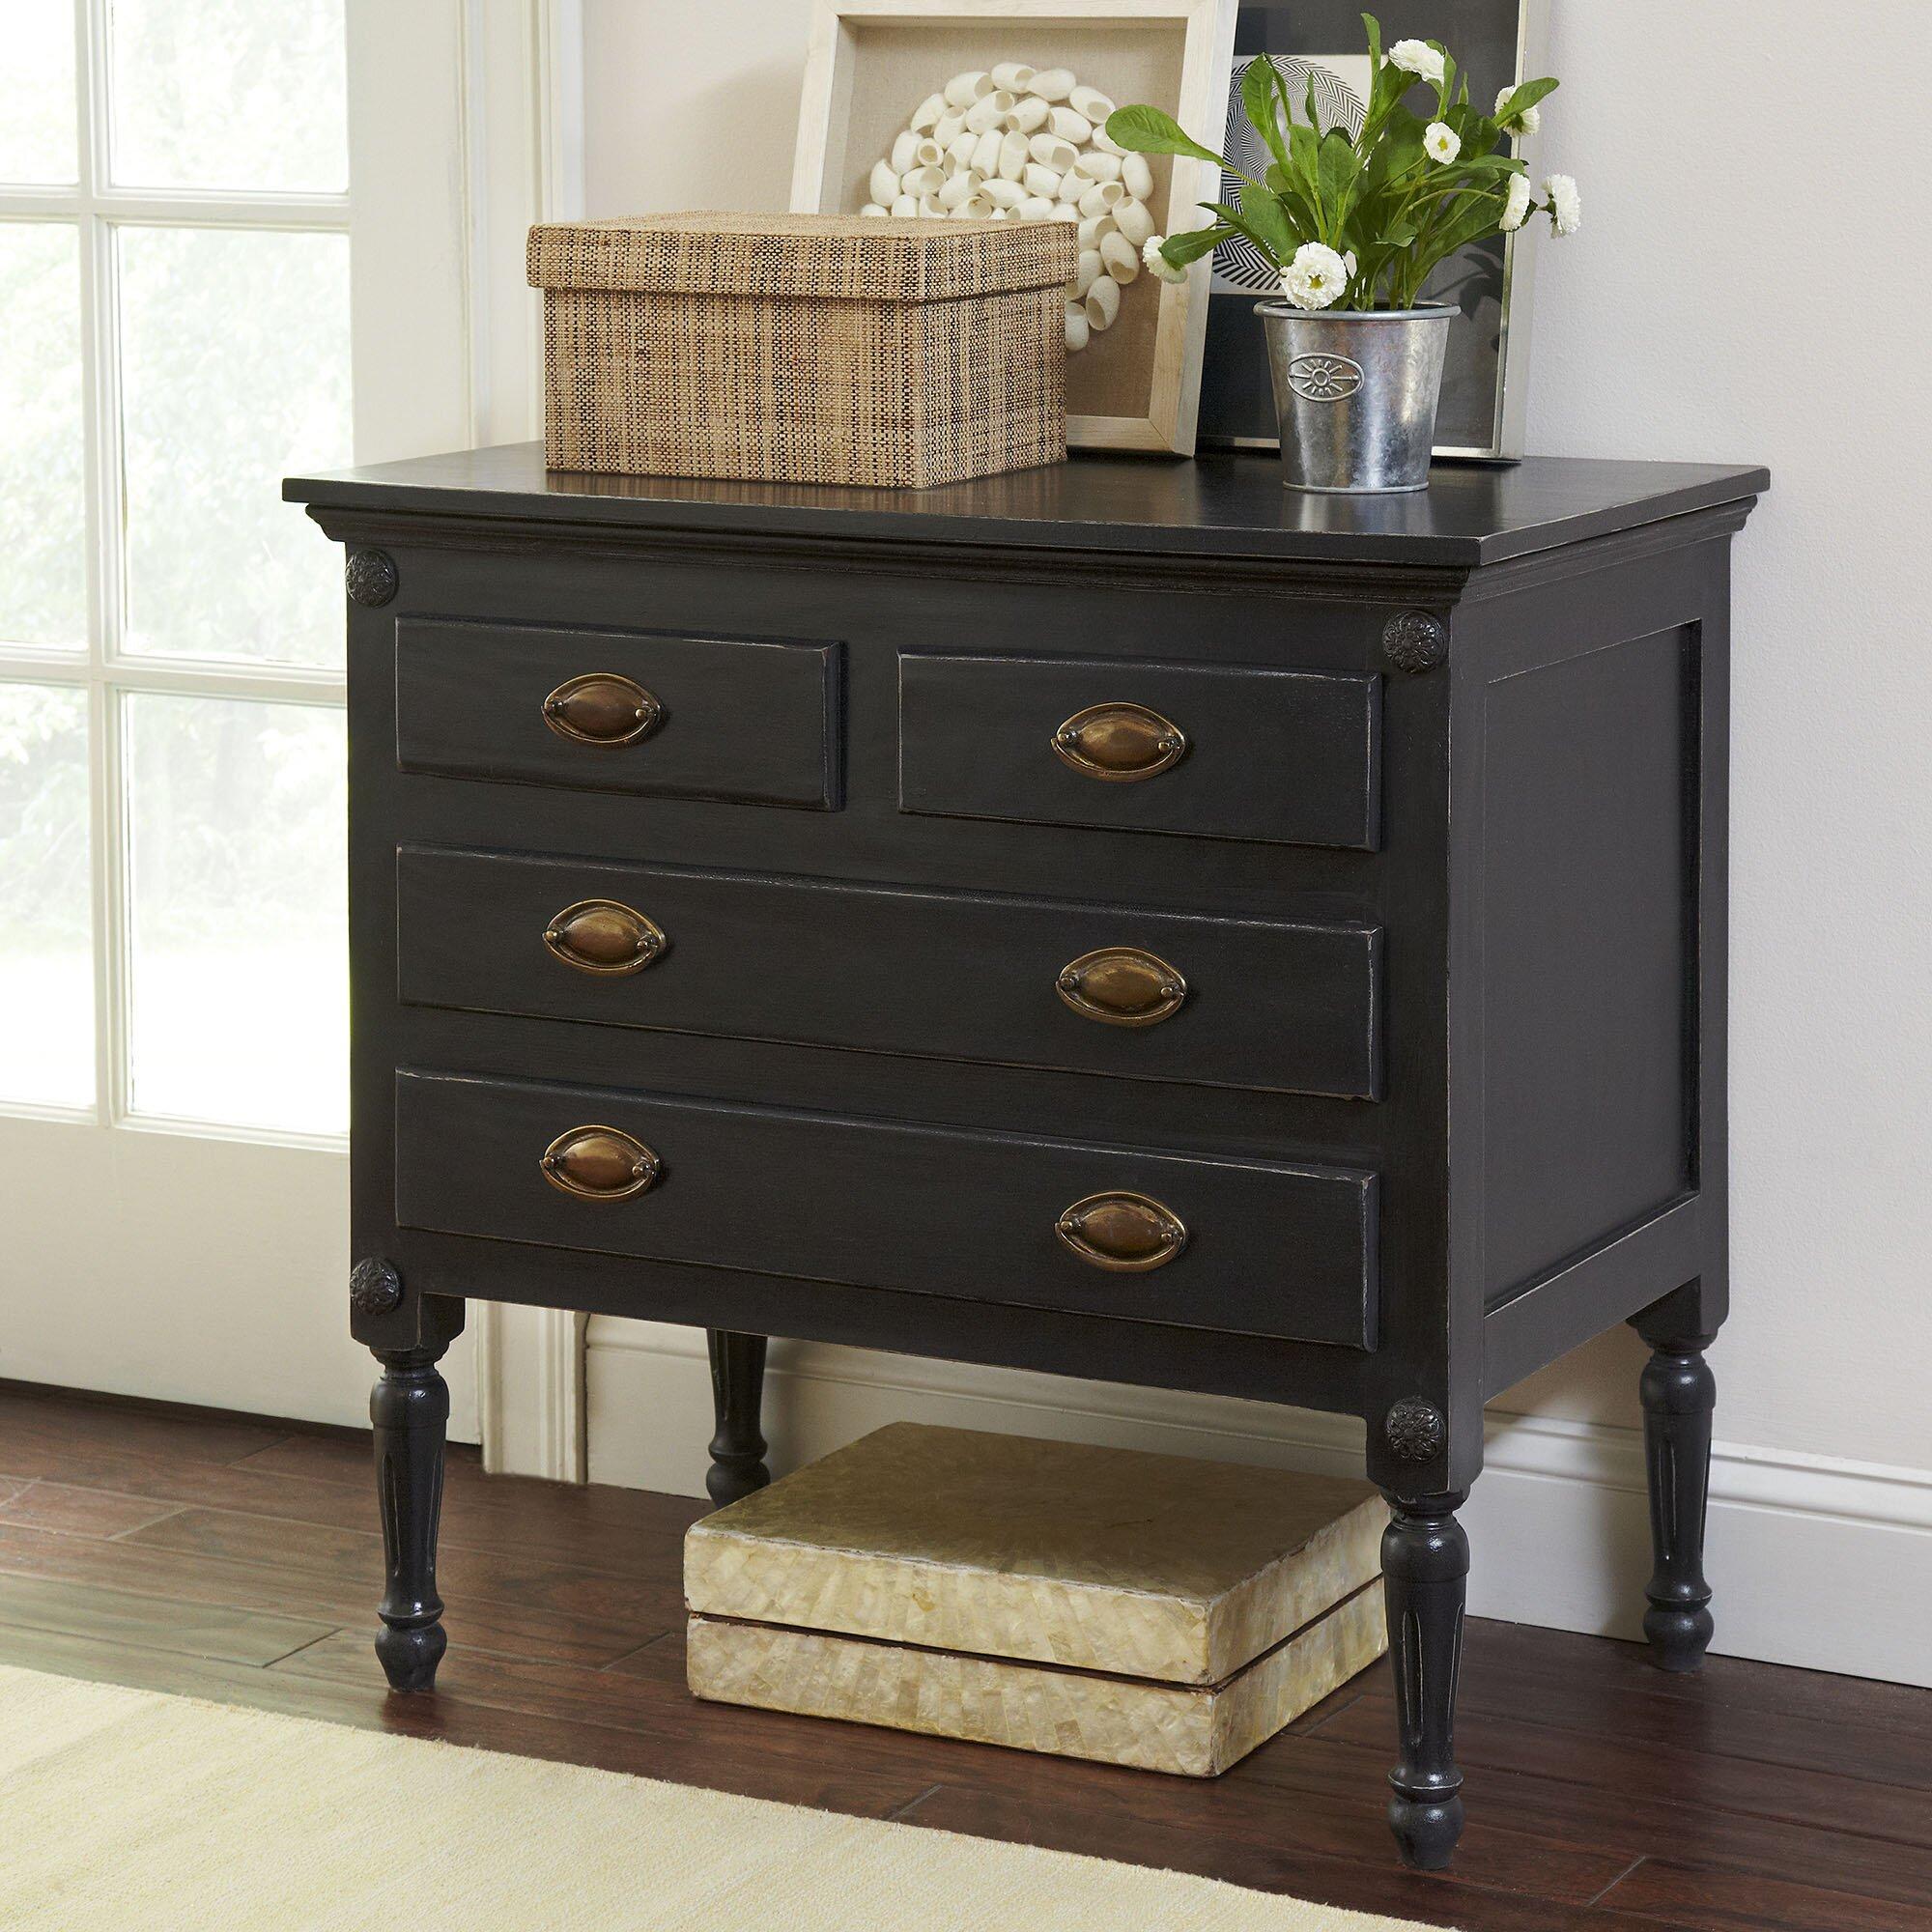 Birch lane griffith dresser reviews wayfair for Lane bedroom furniture